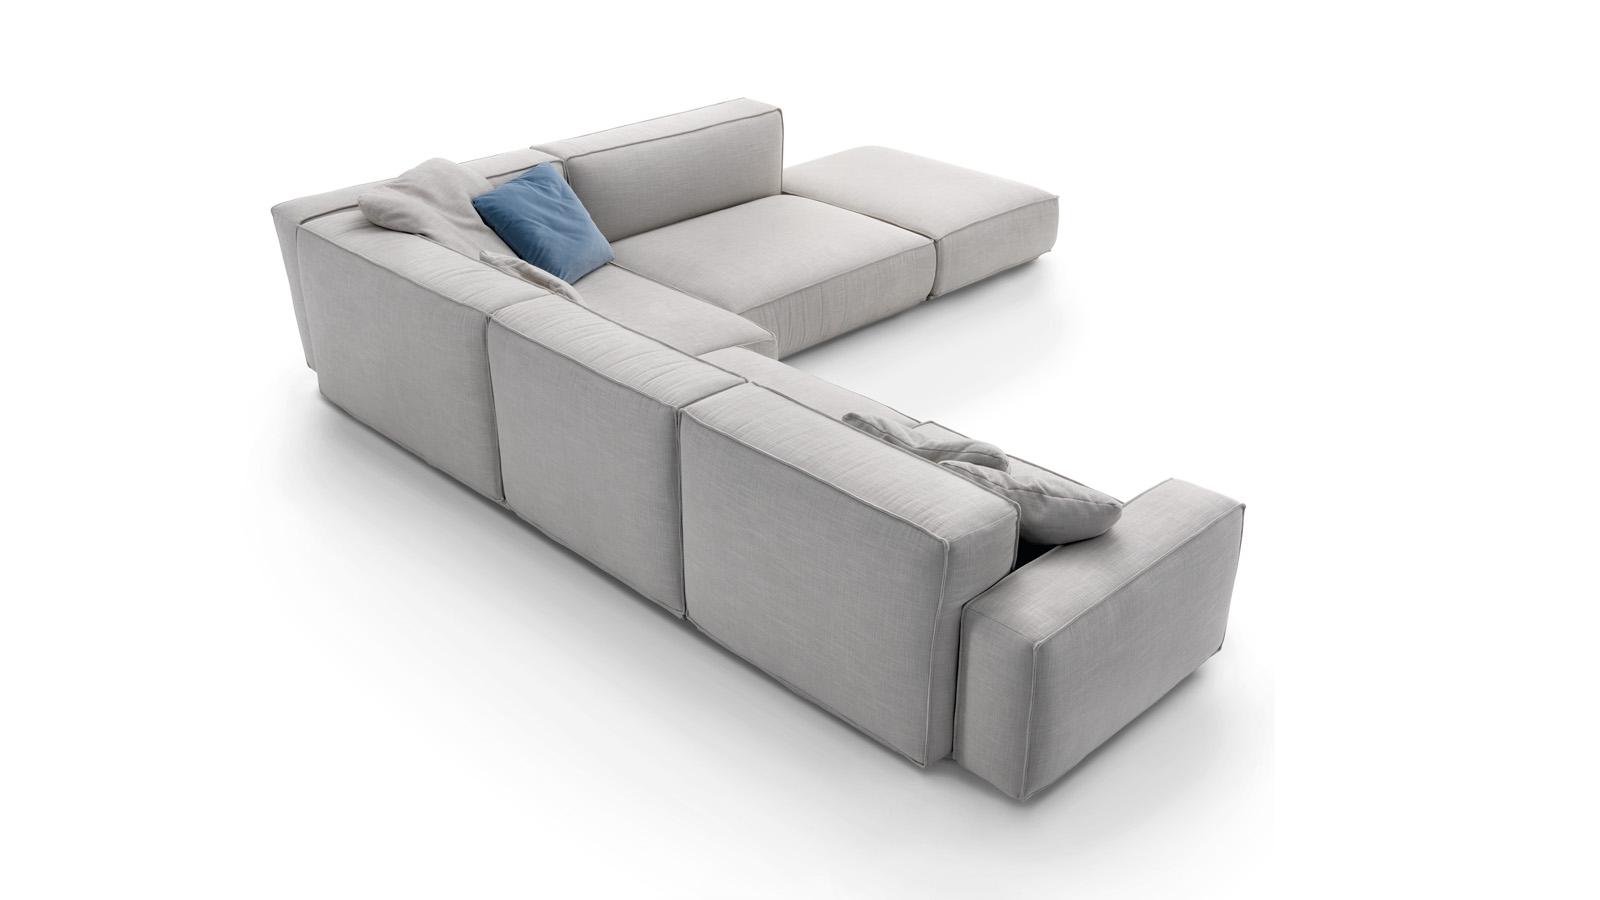 TinnappelMetz-arflex-Marechiaro-sofa-09